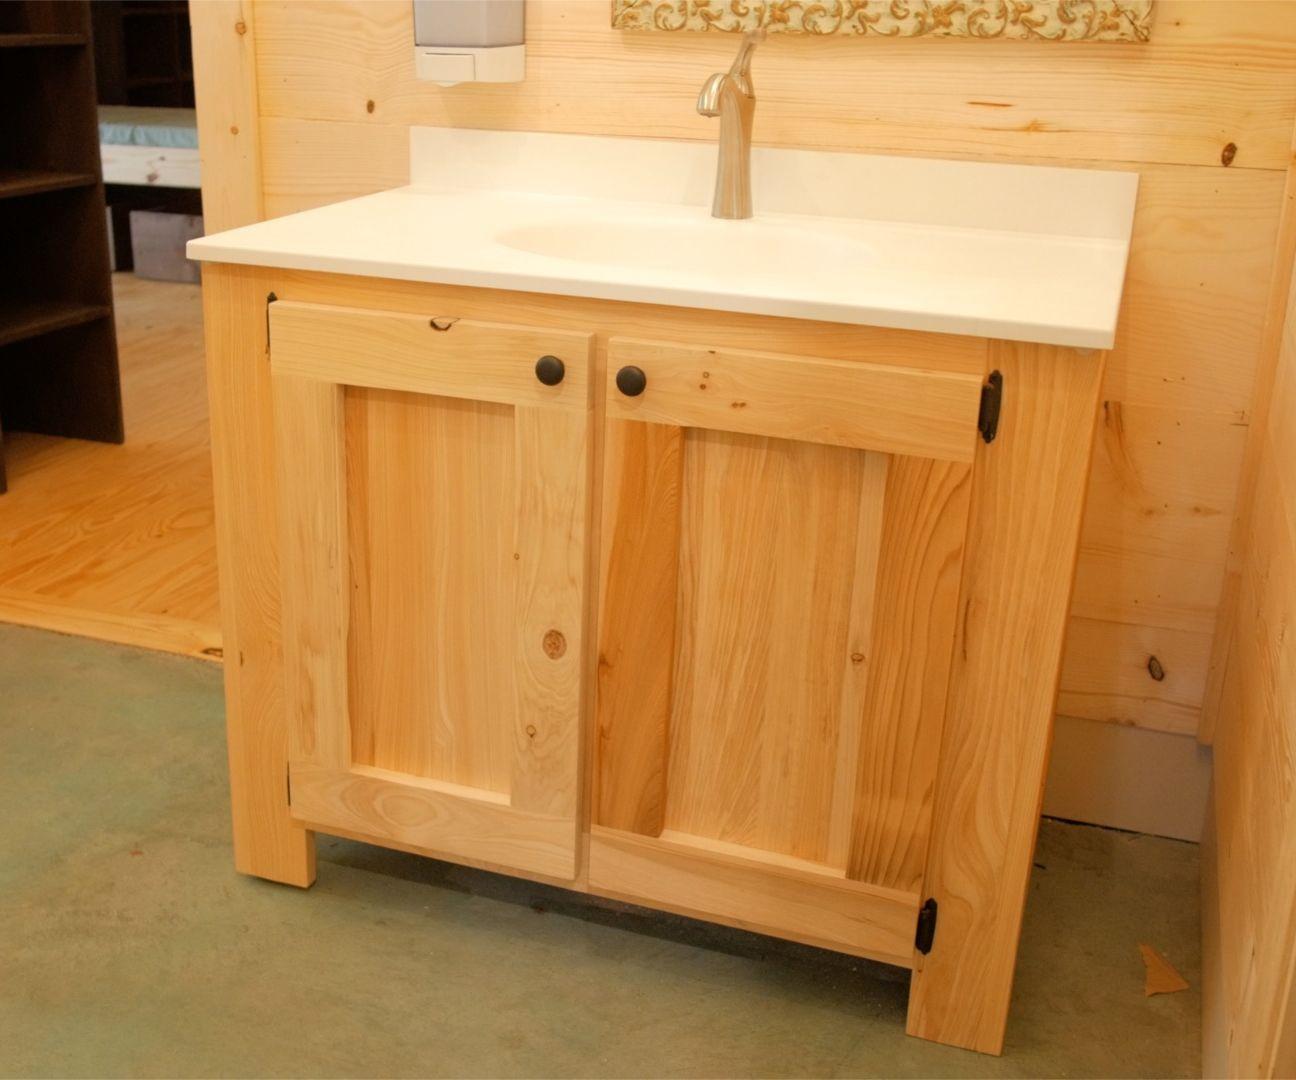 . DIY Rustic Bathroom Vanities   How to Build   Woodworking  14 Steps